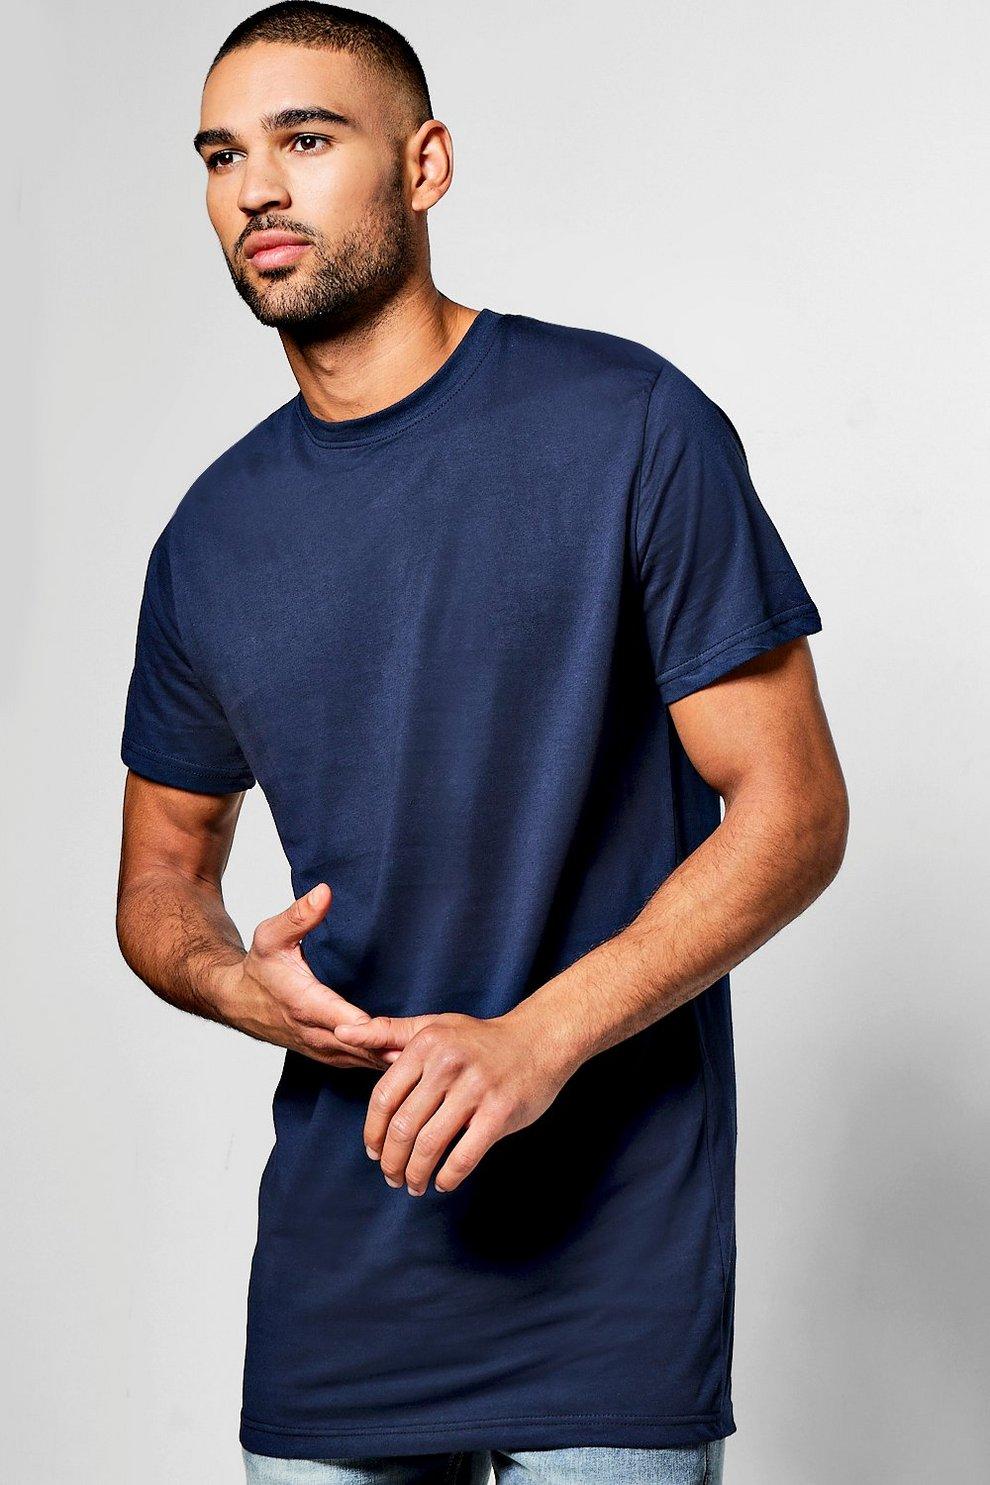 cde9eb8737fe5 t-shirt très long, Marine, Homme